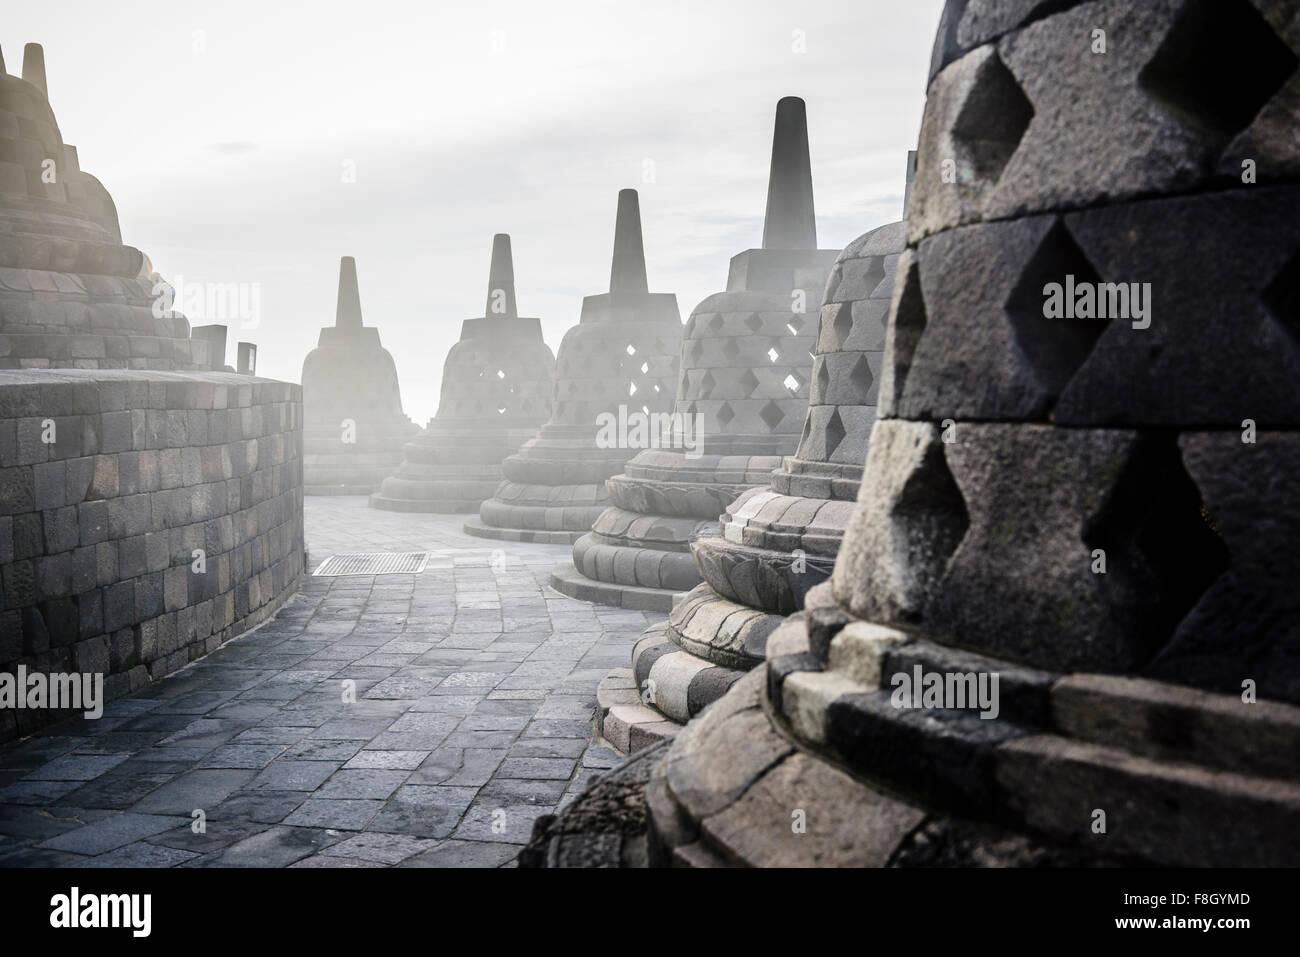 Monuments in Borobudur, Jawa Tengah, Indonesia - Stock Image